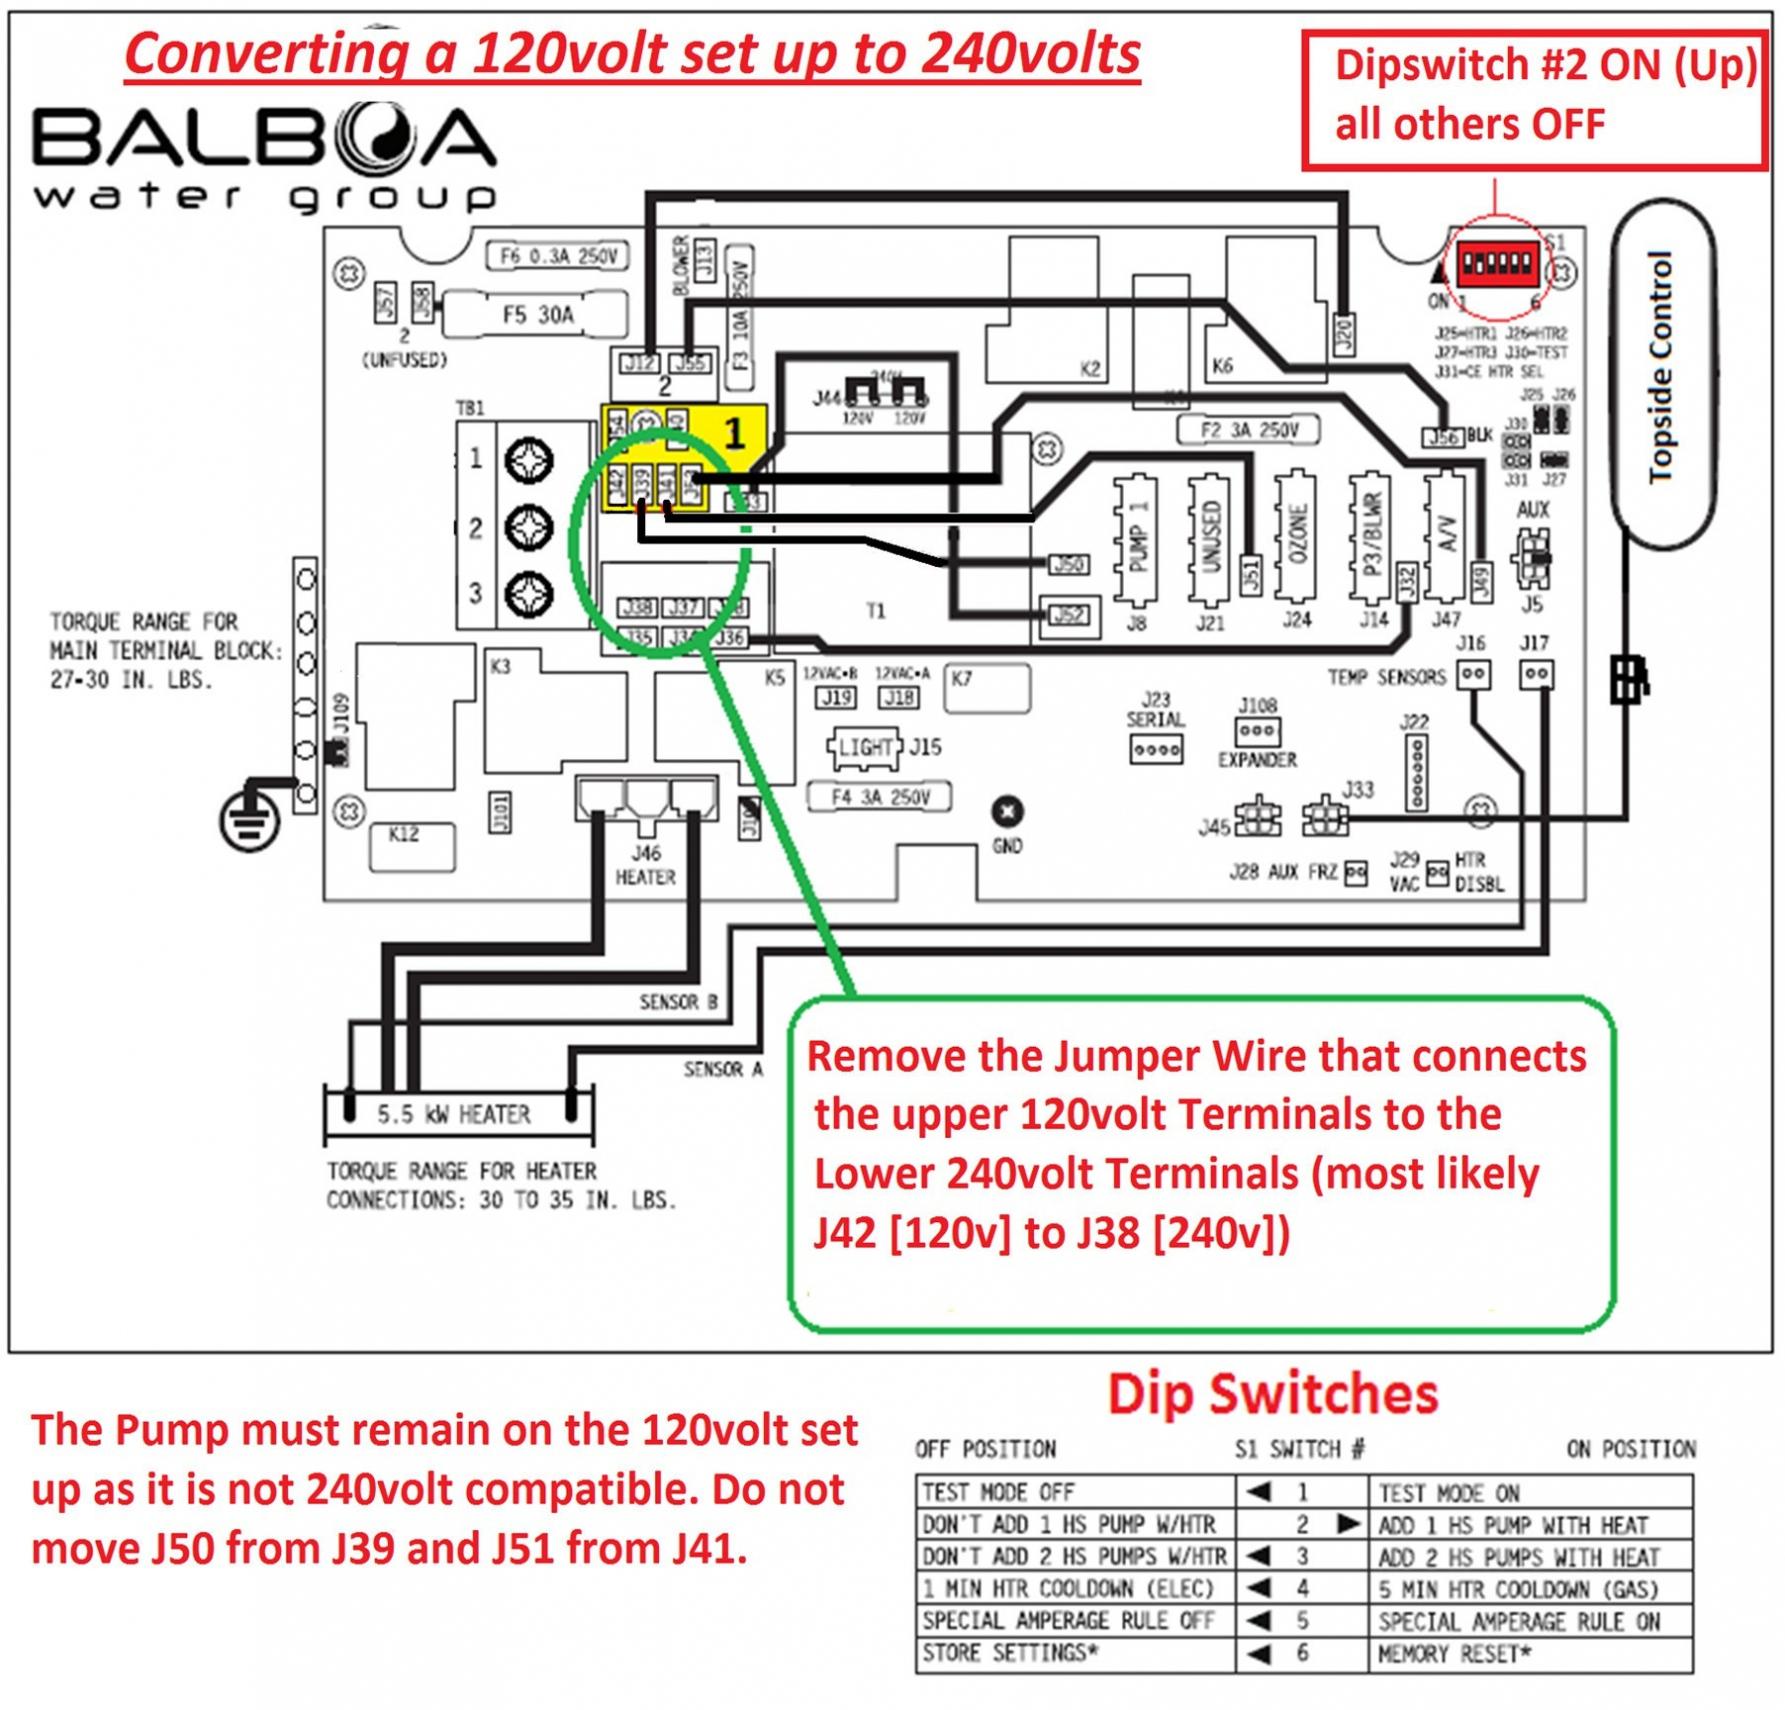 Gfci Breaker Wiring Diagram — Daytonva150 - Gfci Breaker Wiring Diagram